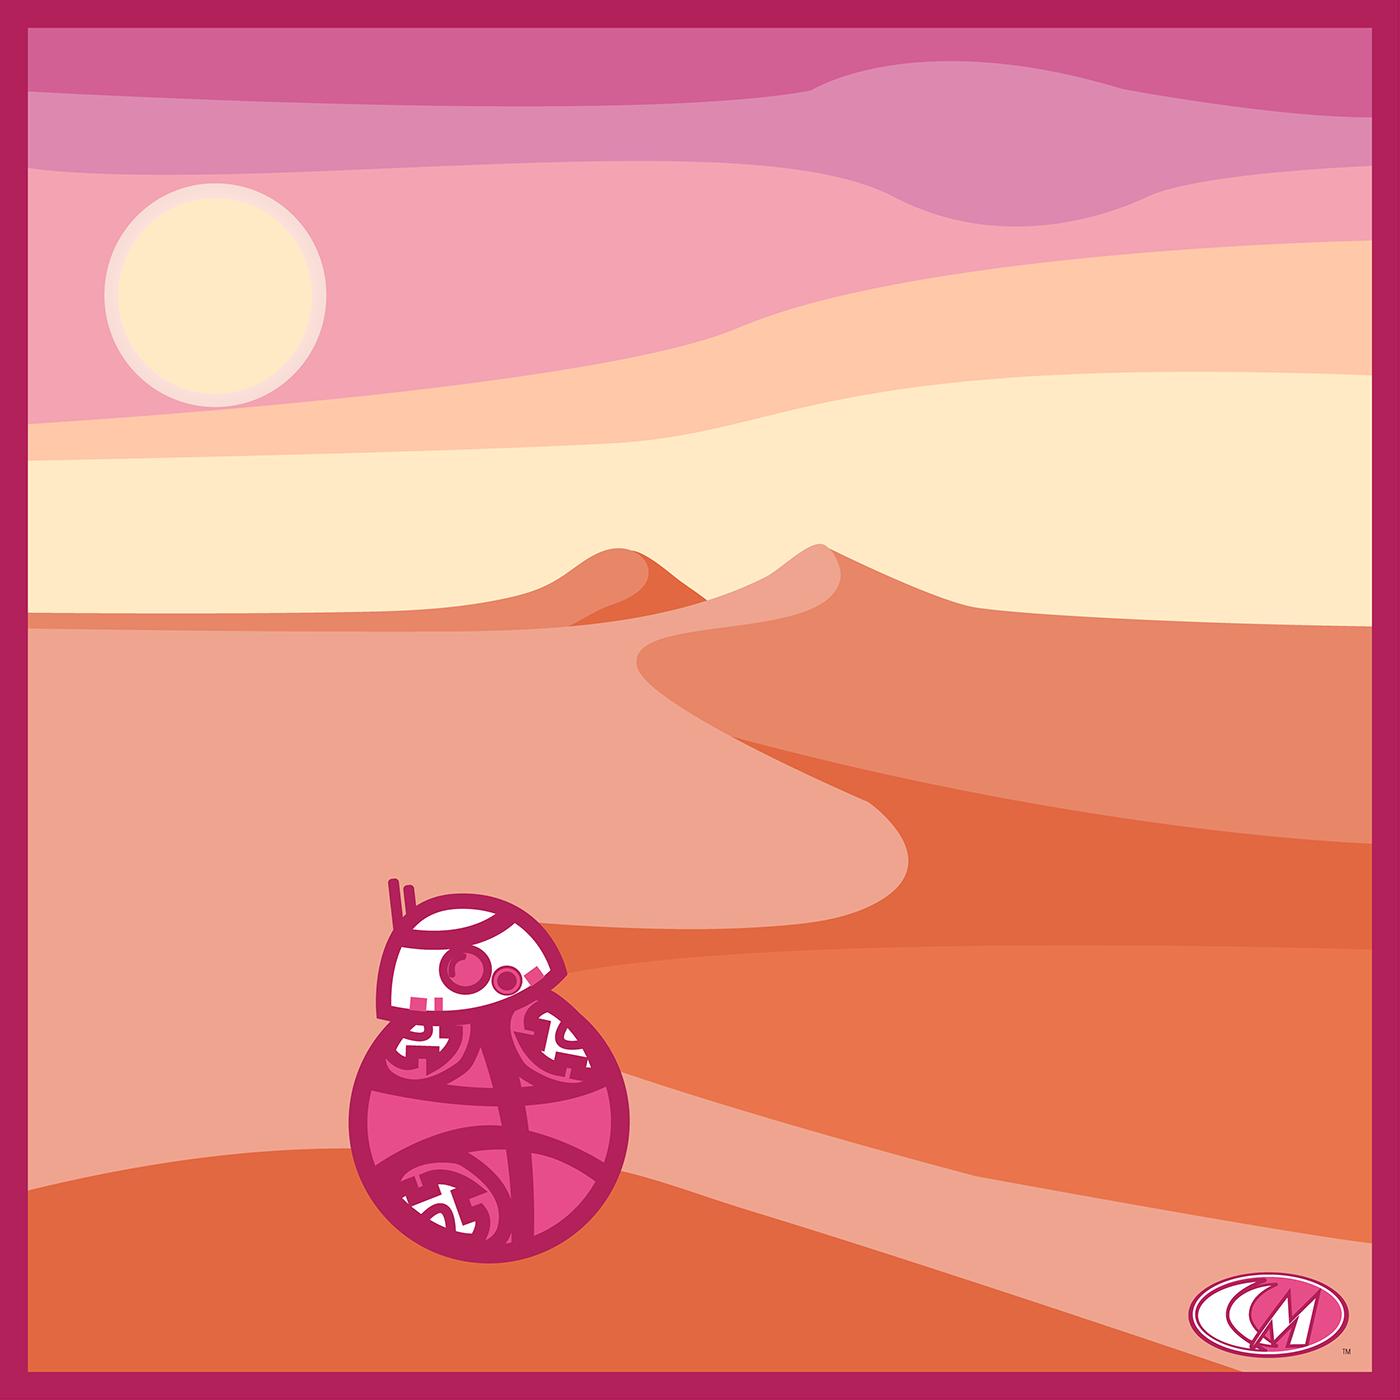 ILLUSTRATION  desert Landscape vector star wars bb8